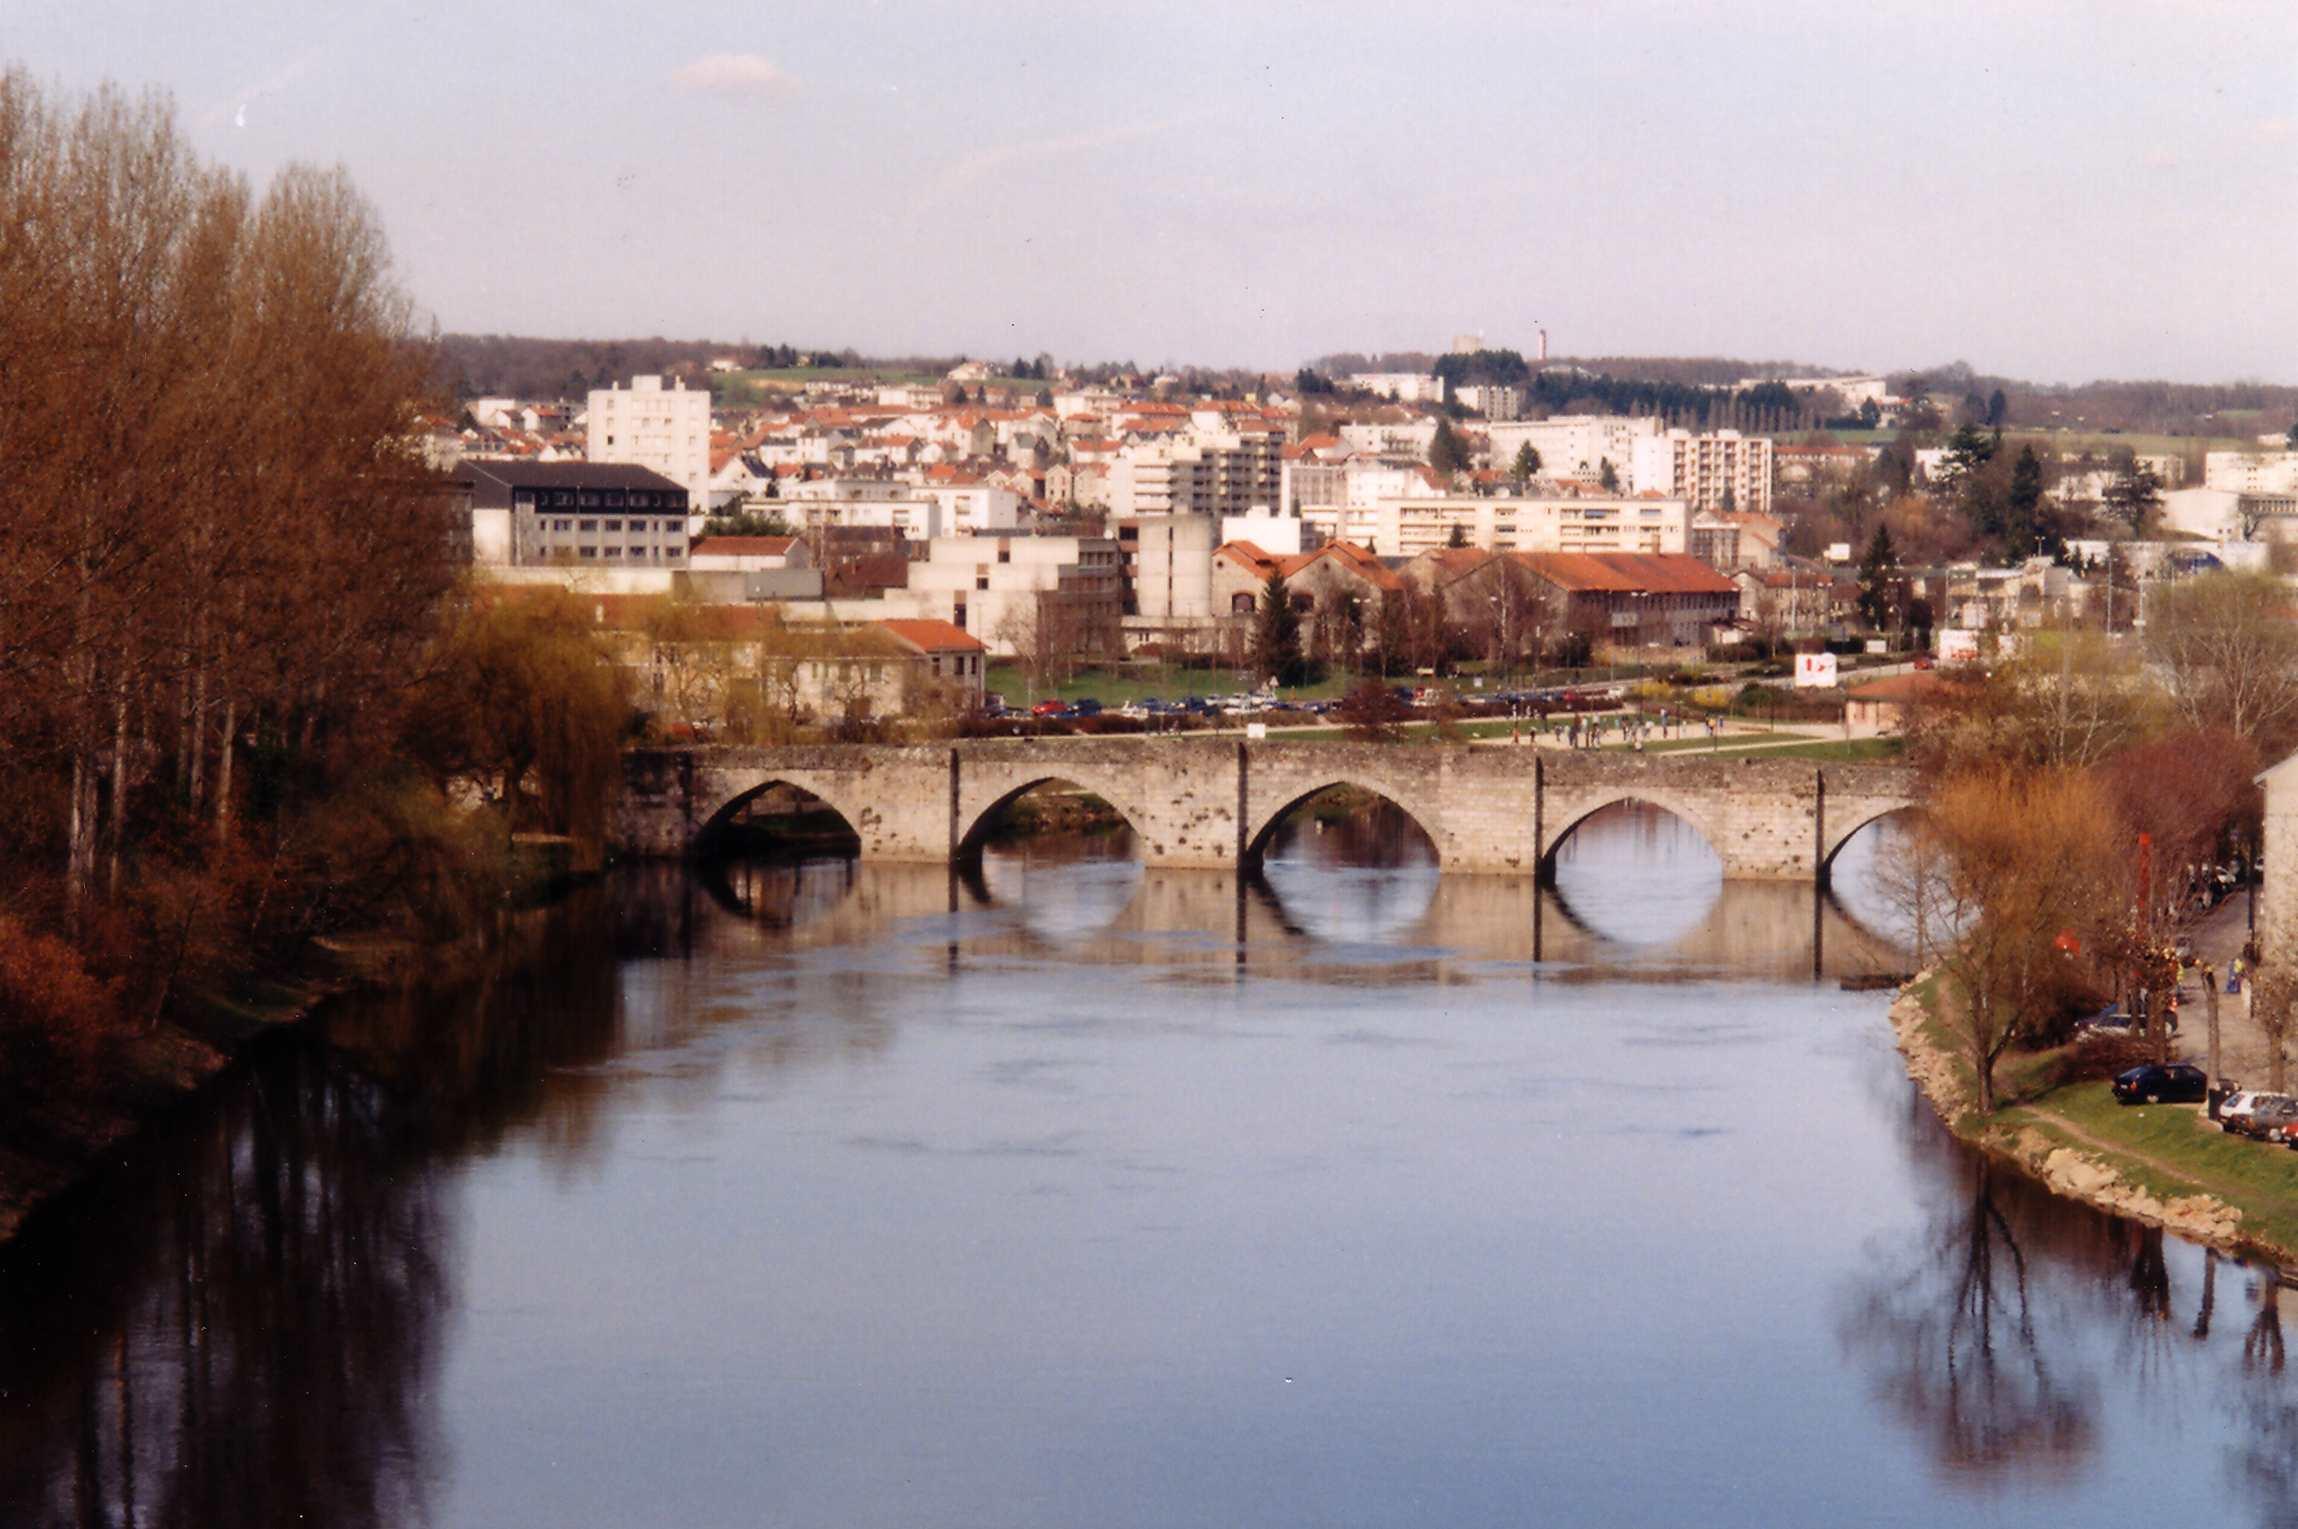 Limoges-Saint-Etienne-bridge